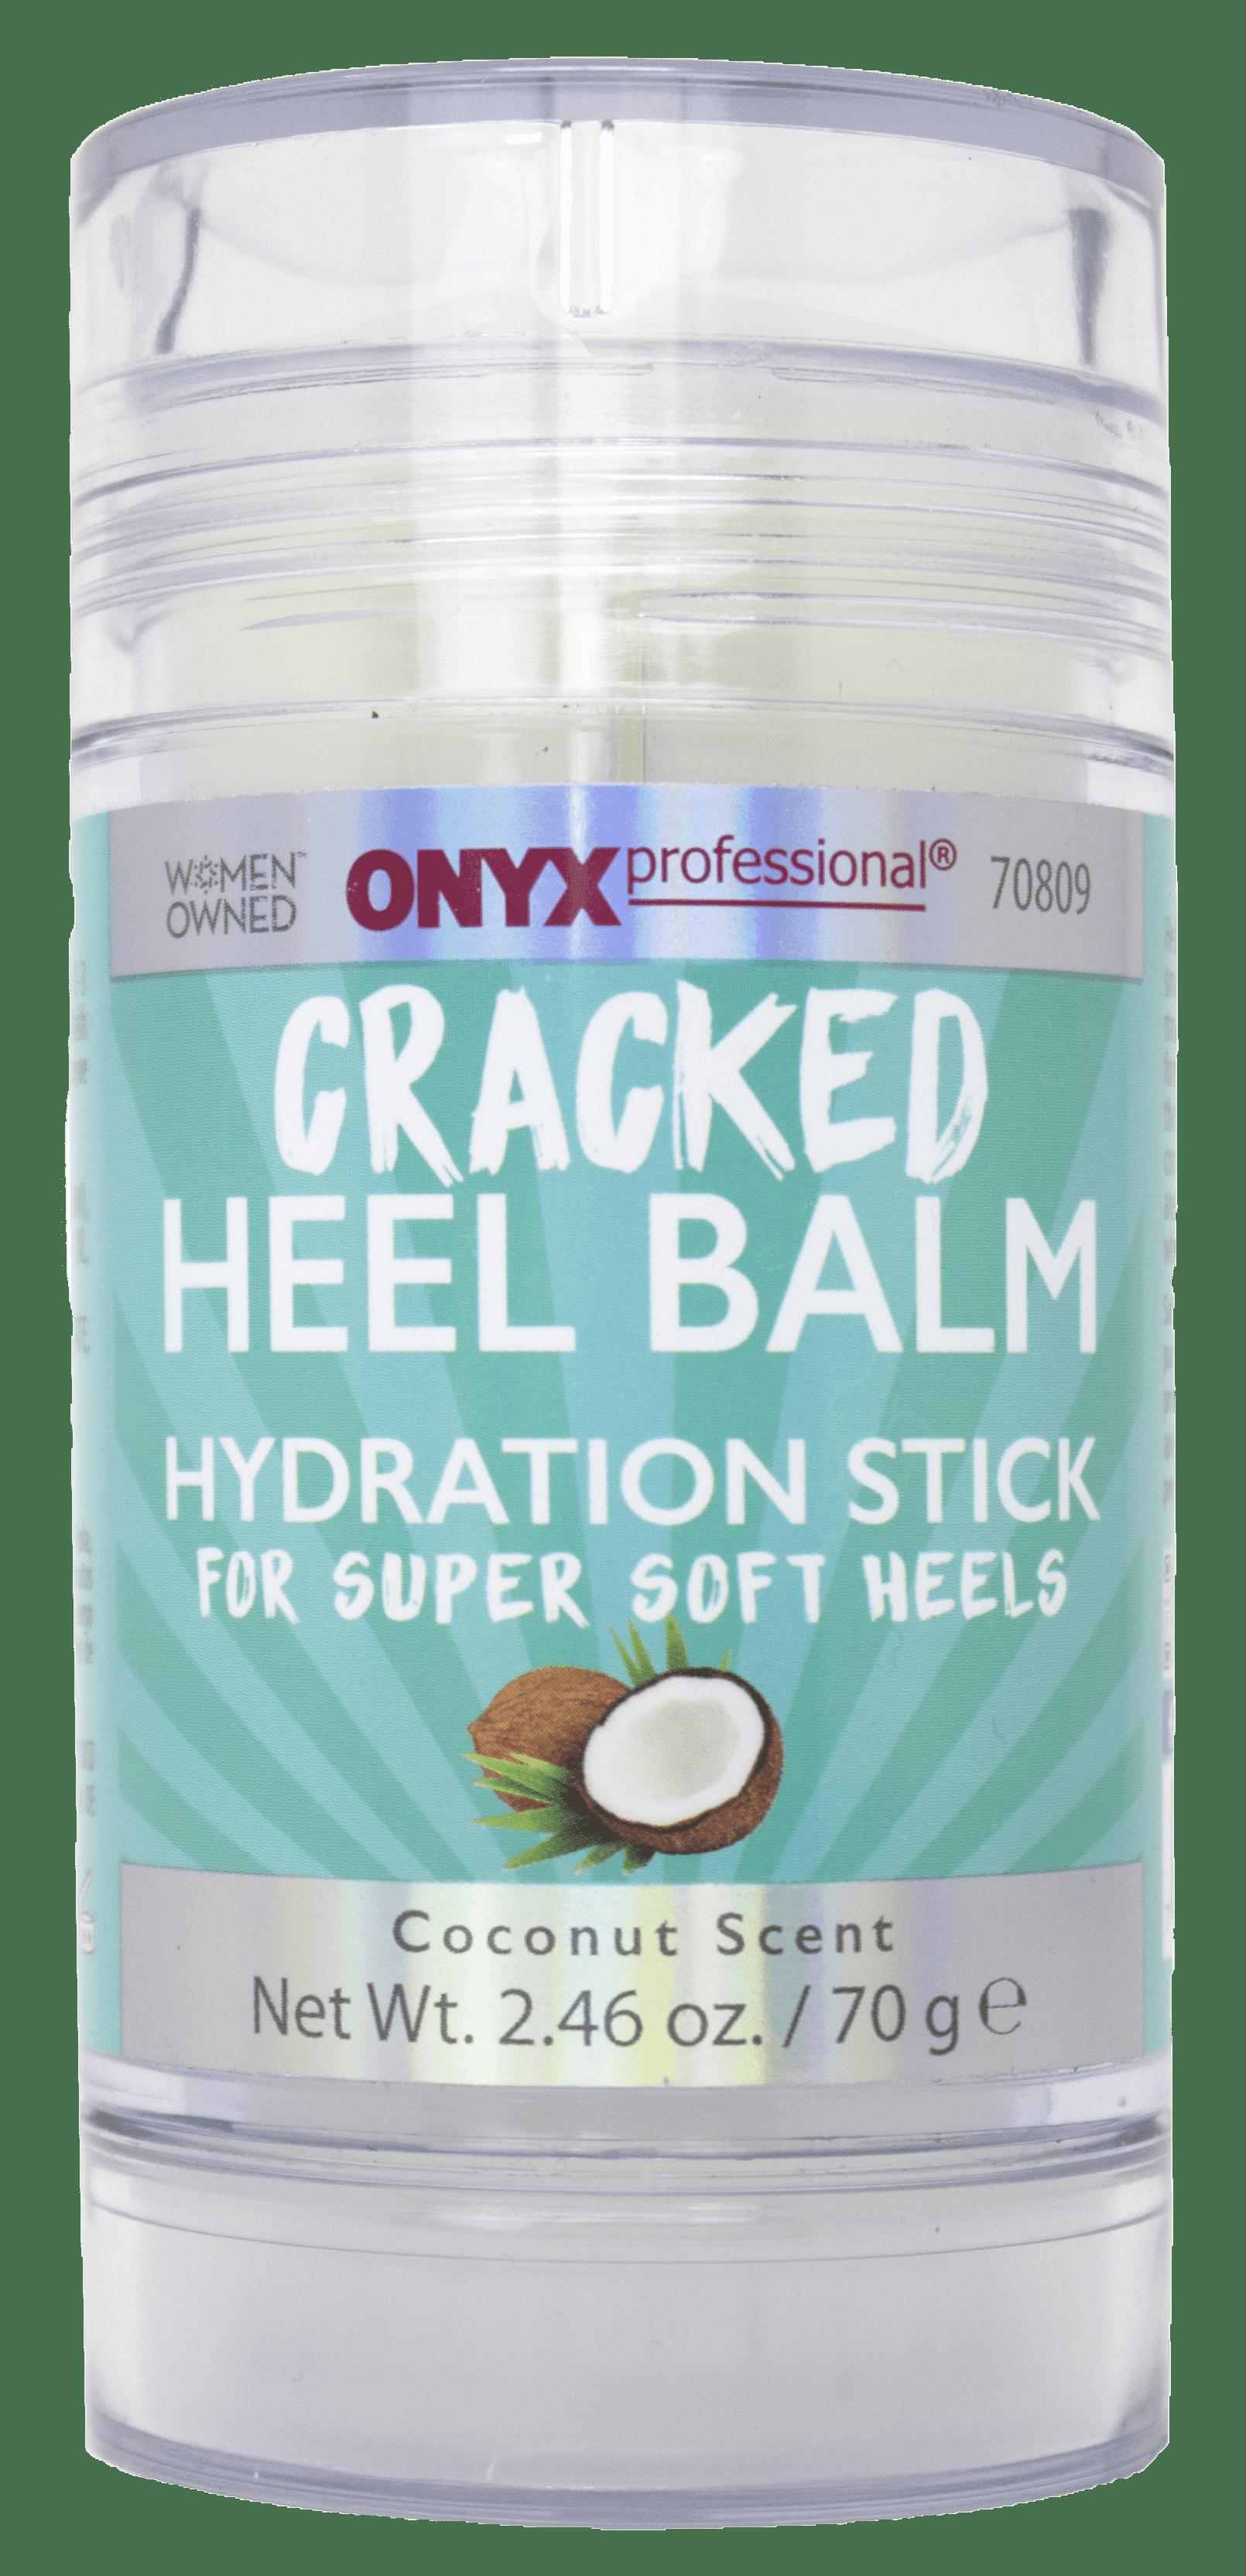 Onyx Cracked Heel Balm Hydration Stick – Walmart Inventory Checker